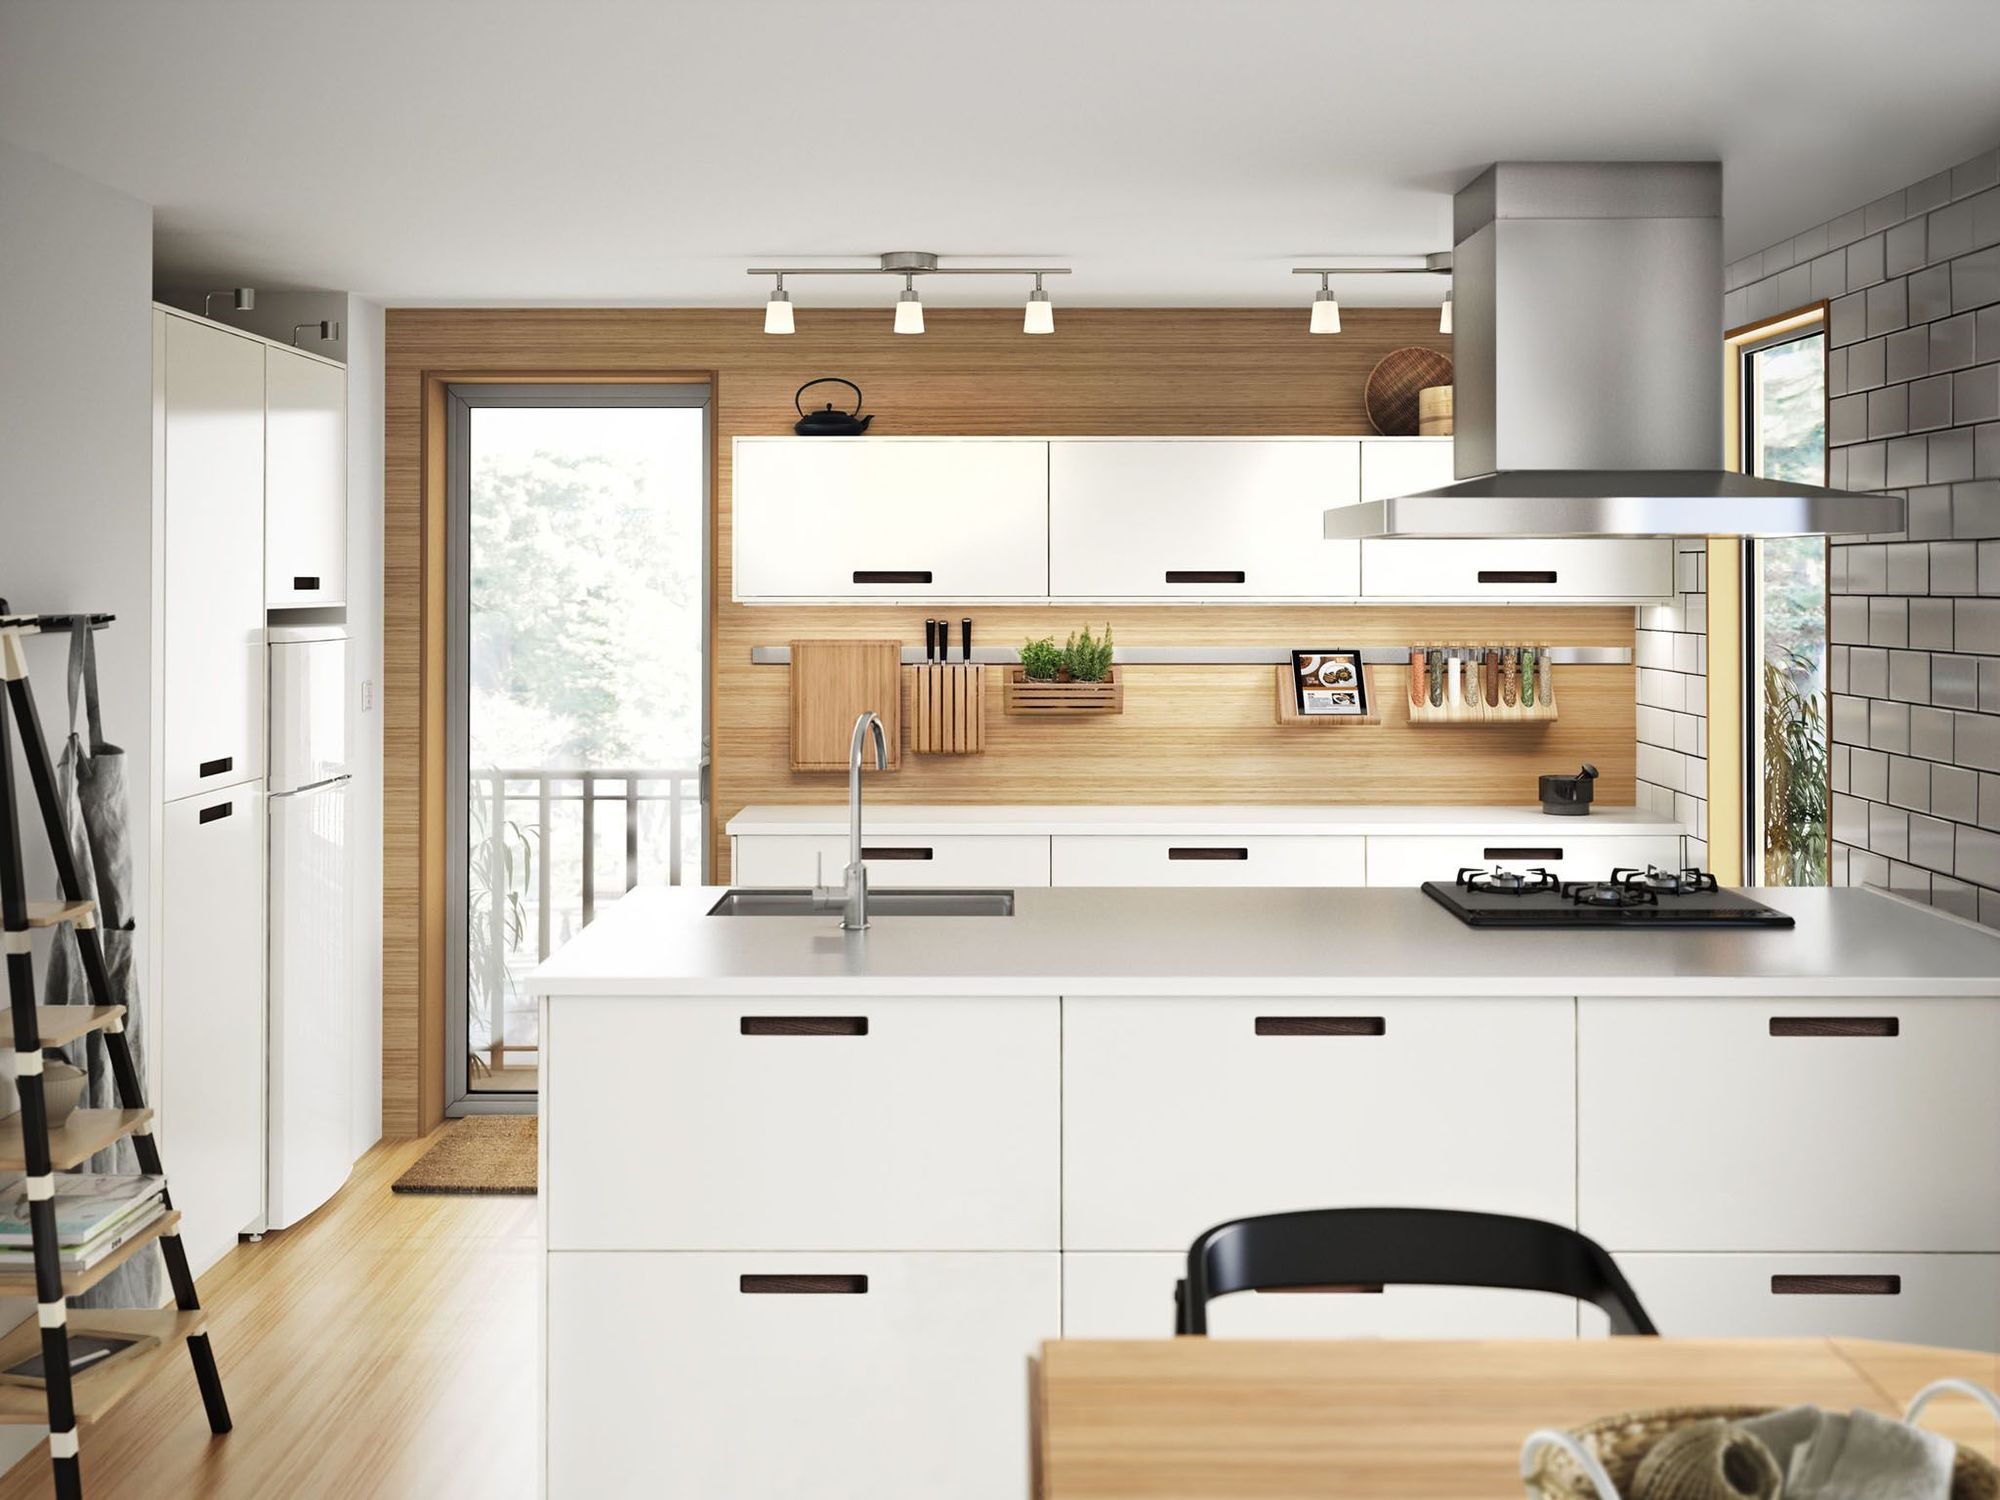 IKEA kitchen islands: a practical desk area